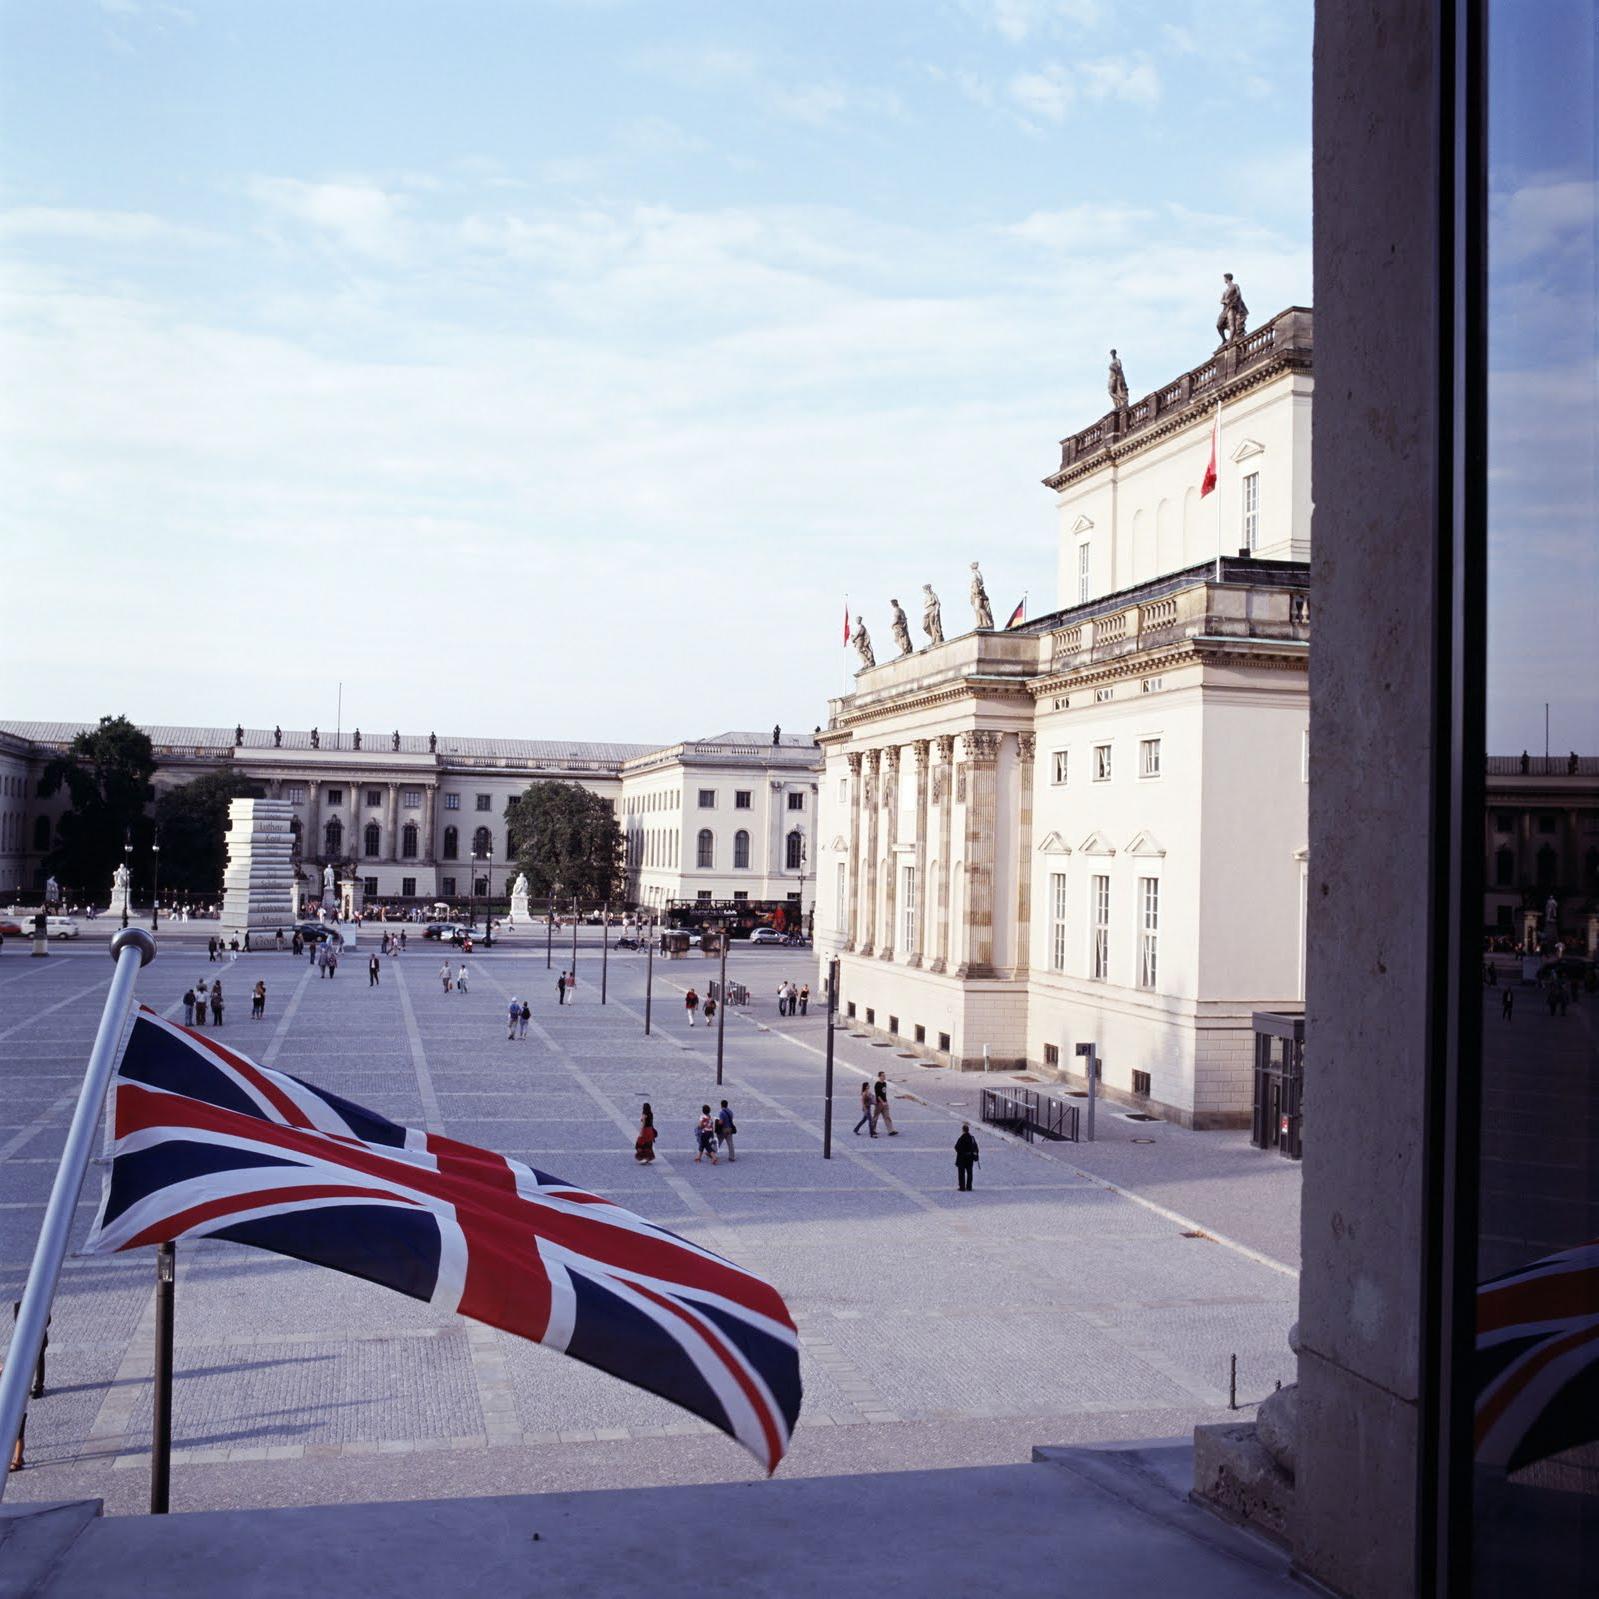 Hotel-de-Rome-Berlin-Gendarmenmarkt-5